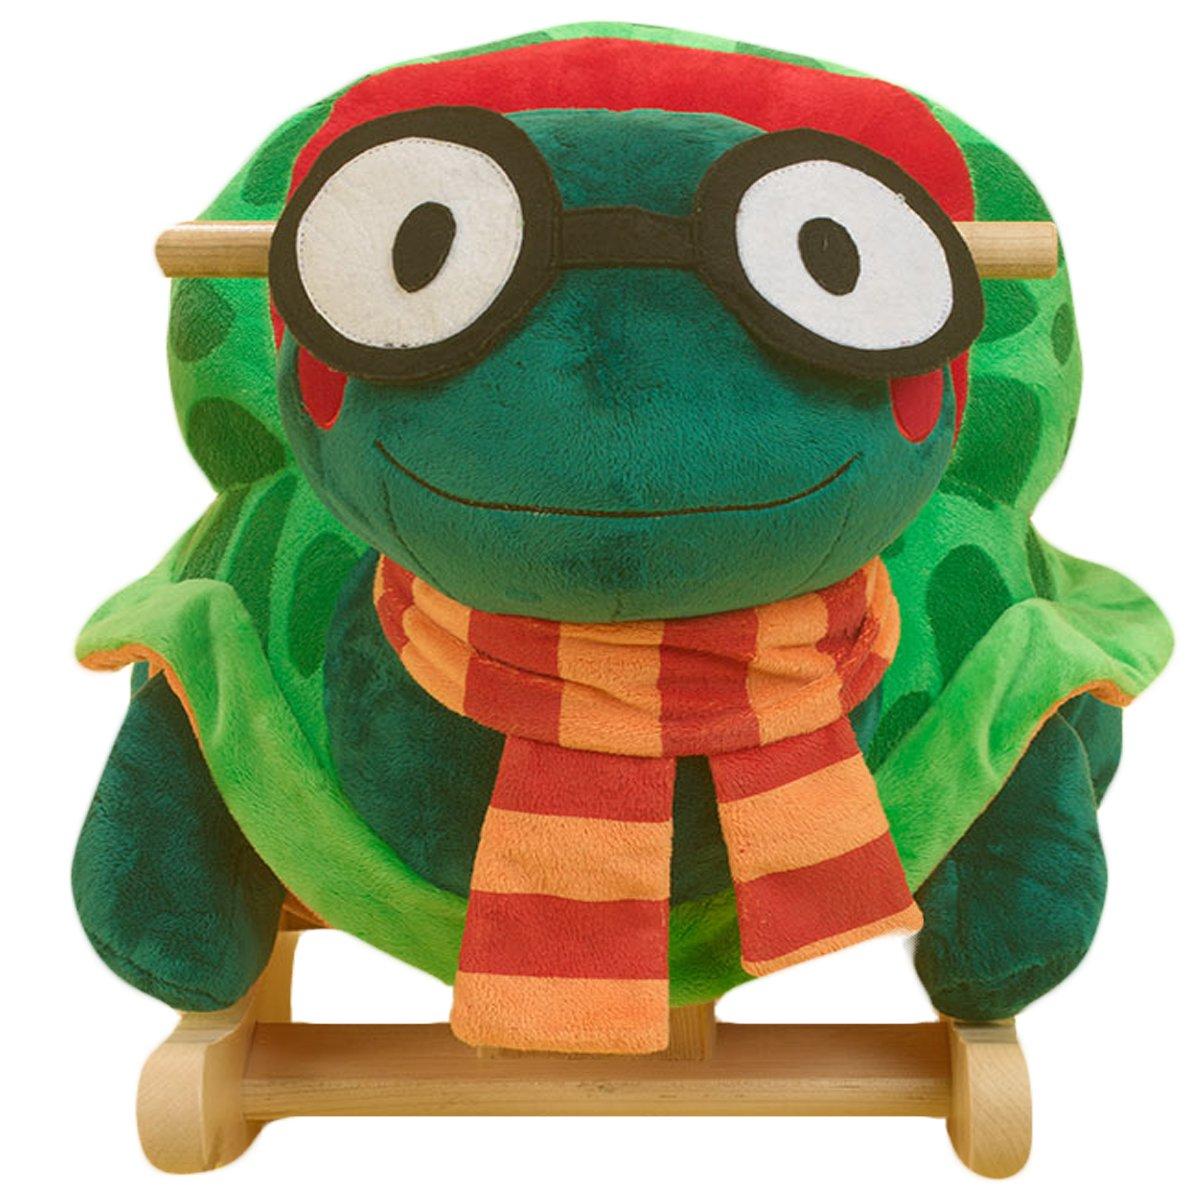 Amazon.com: Rockabye Sheldon la tortuga Rocker: Toys & Games